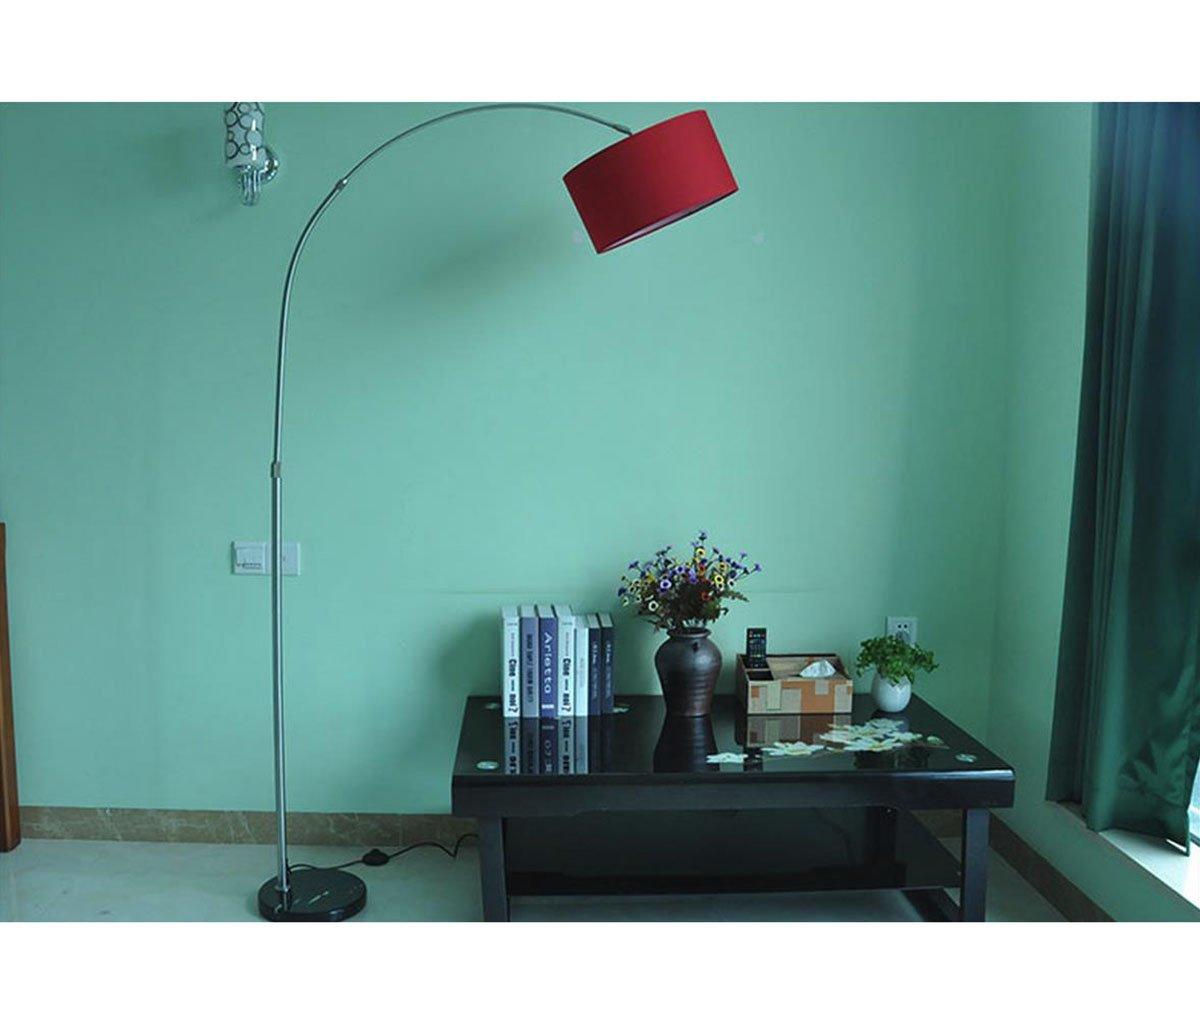 Zgp Lampes De À Led PianoSalon Chambre Sol Applique hQCxBsortd